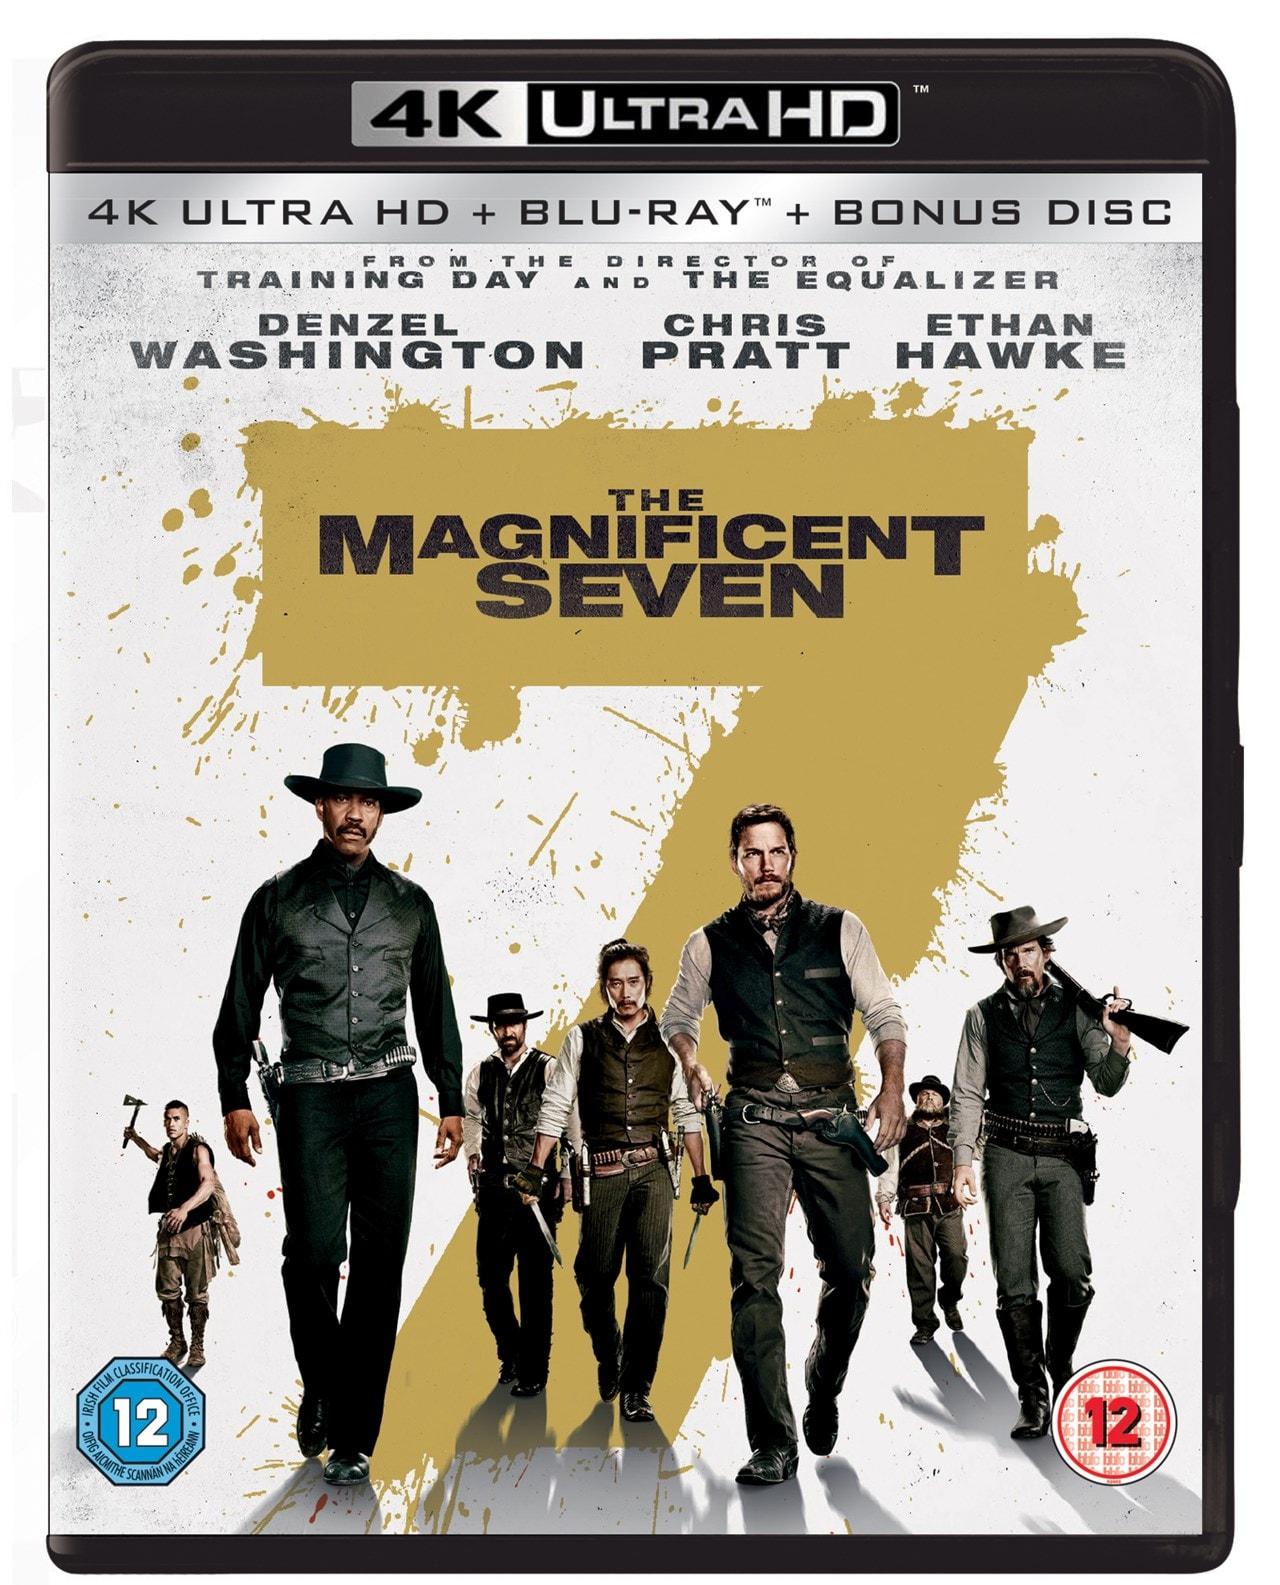 The Magnificent Seven - 1